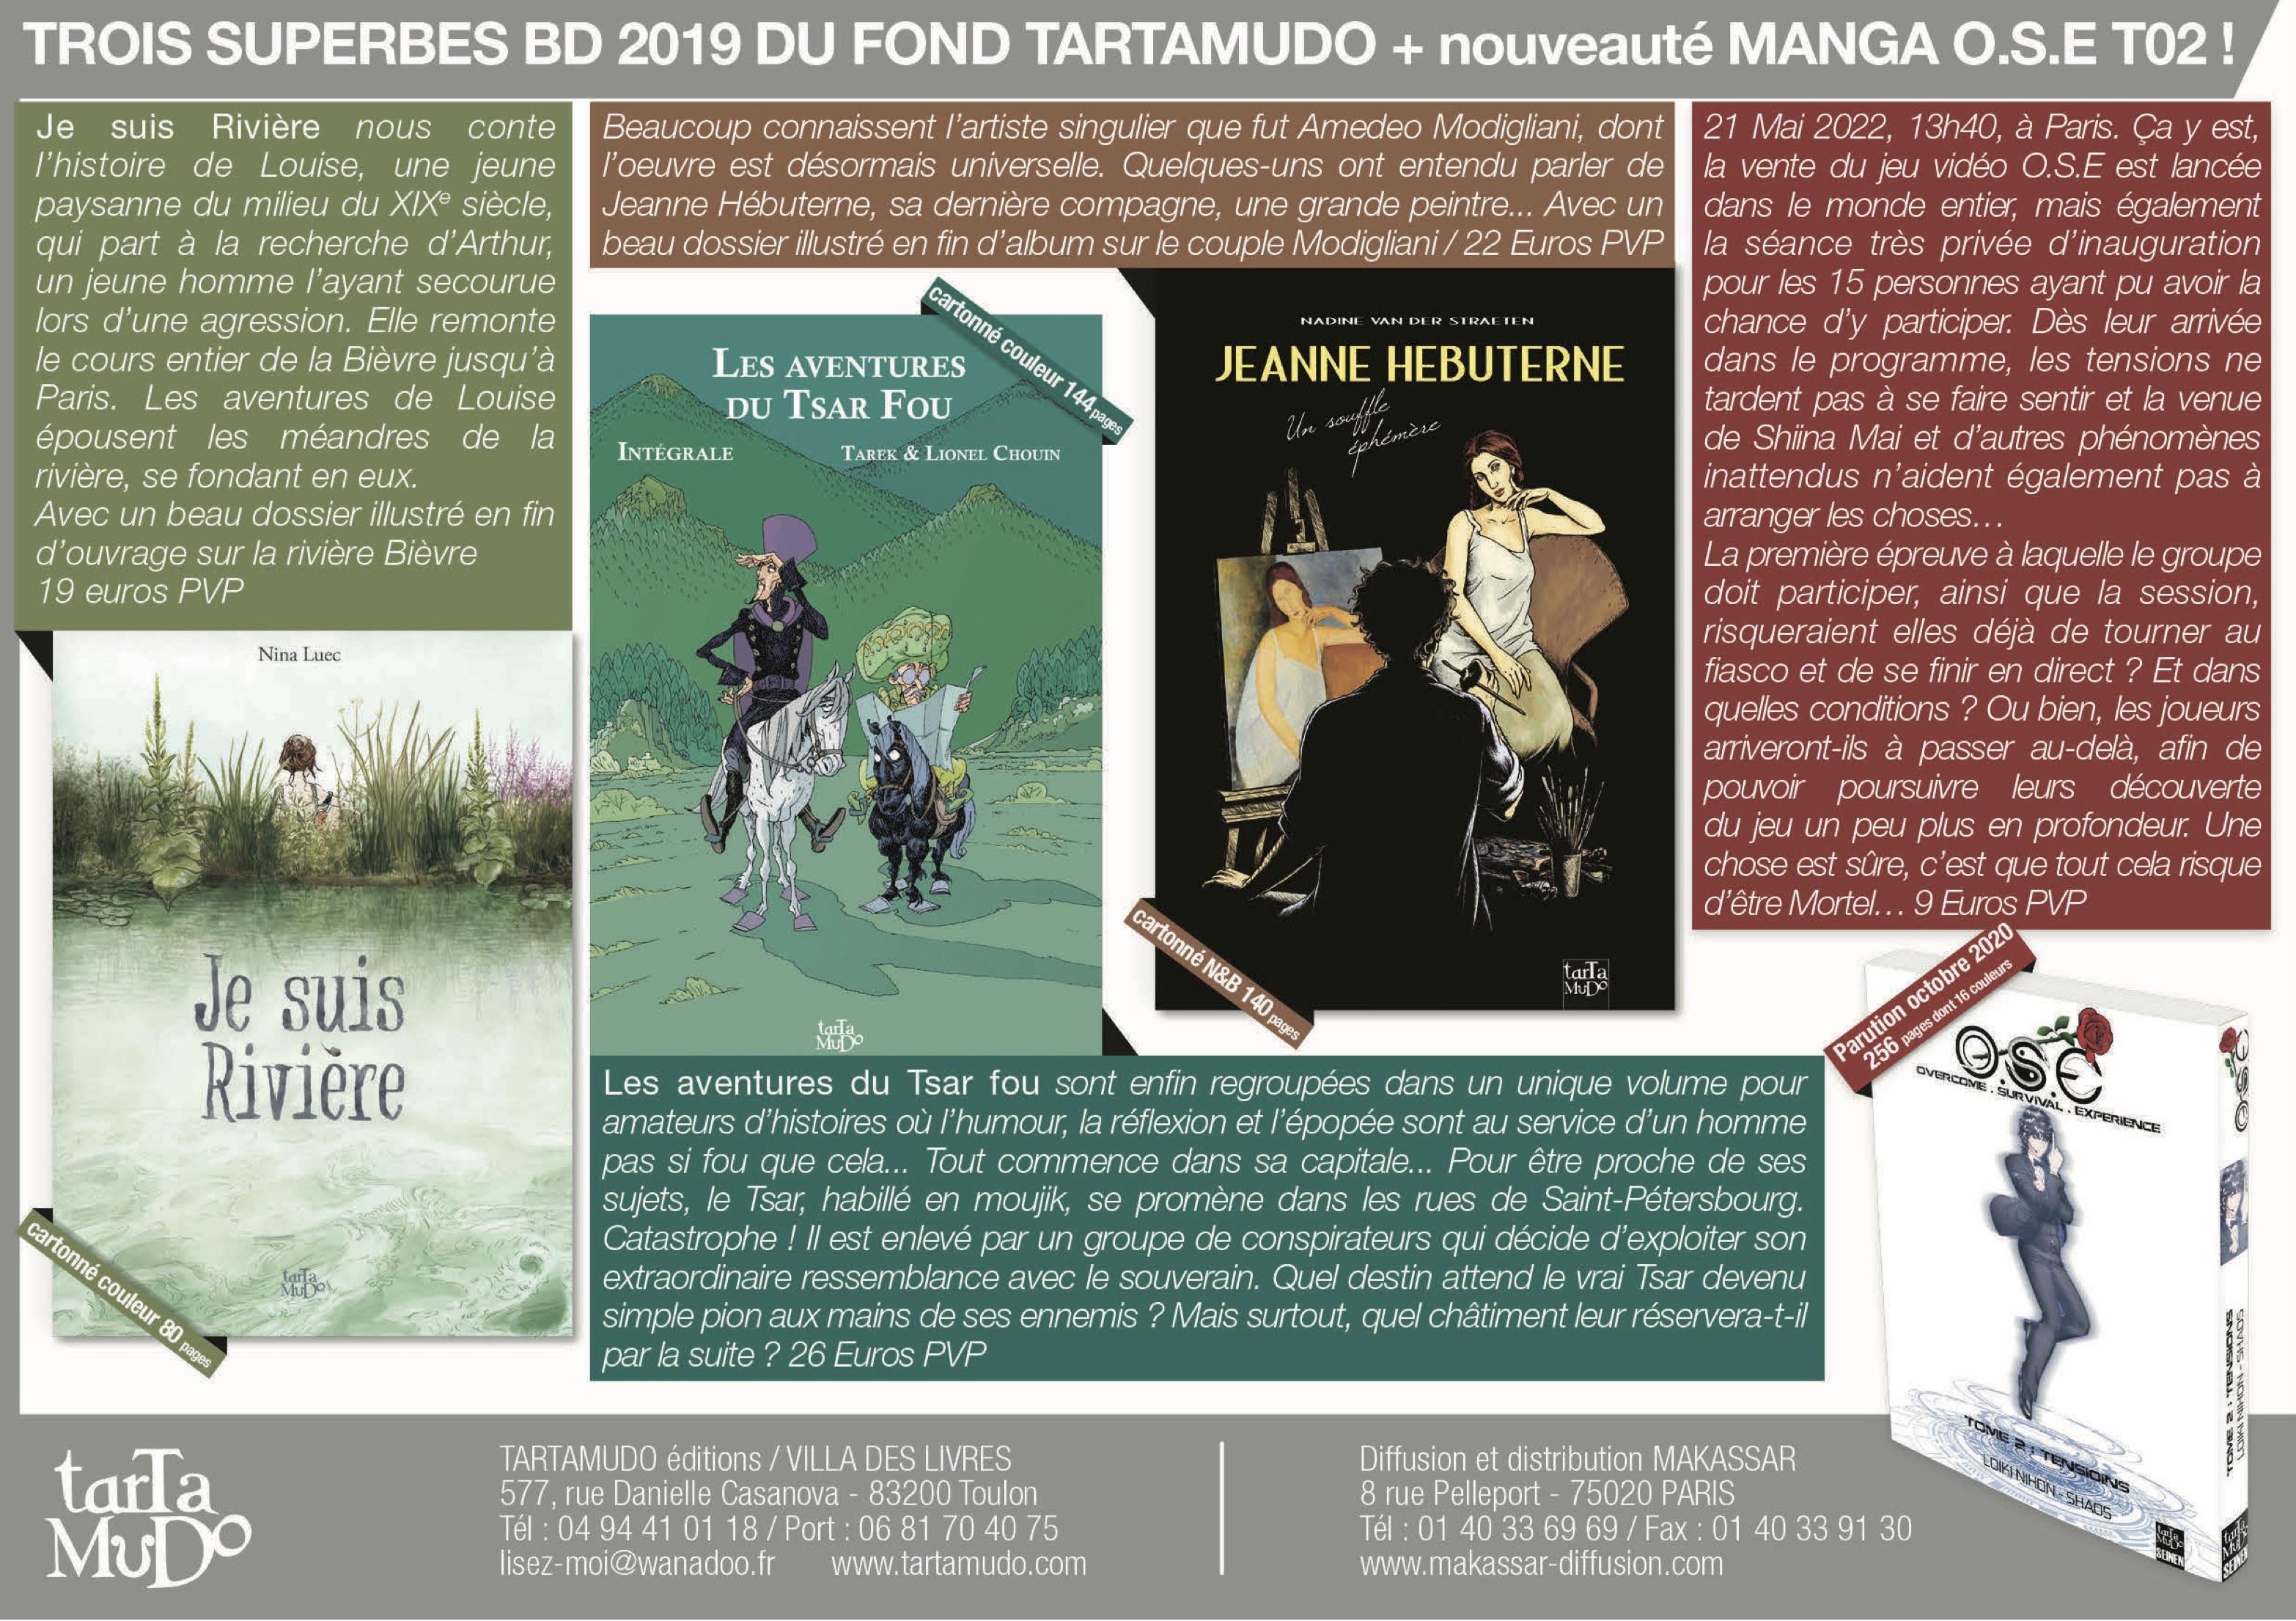 # # 1 BD ANNONCE PUB 4 BD TARTAMUDO BIBLIOTECA - JUILLET 2020 Page 11 DERRIERE LA COLLINE